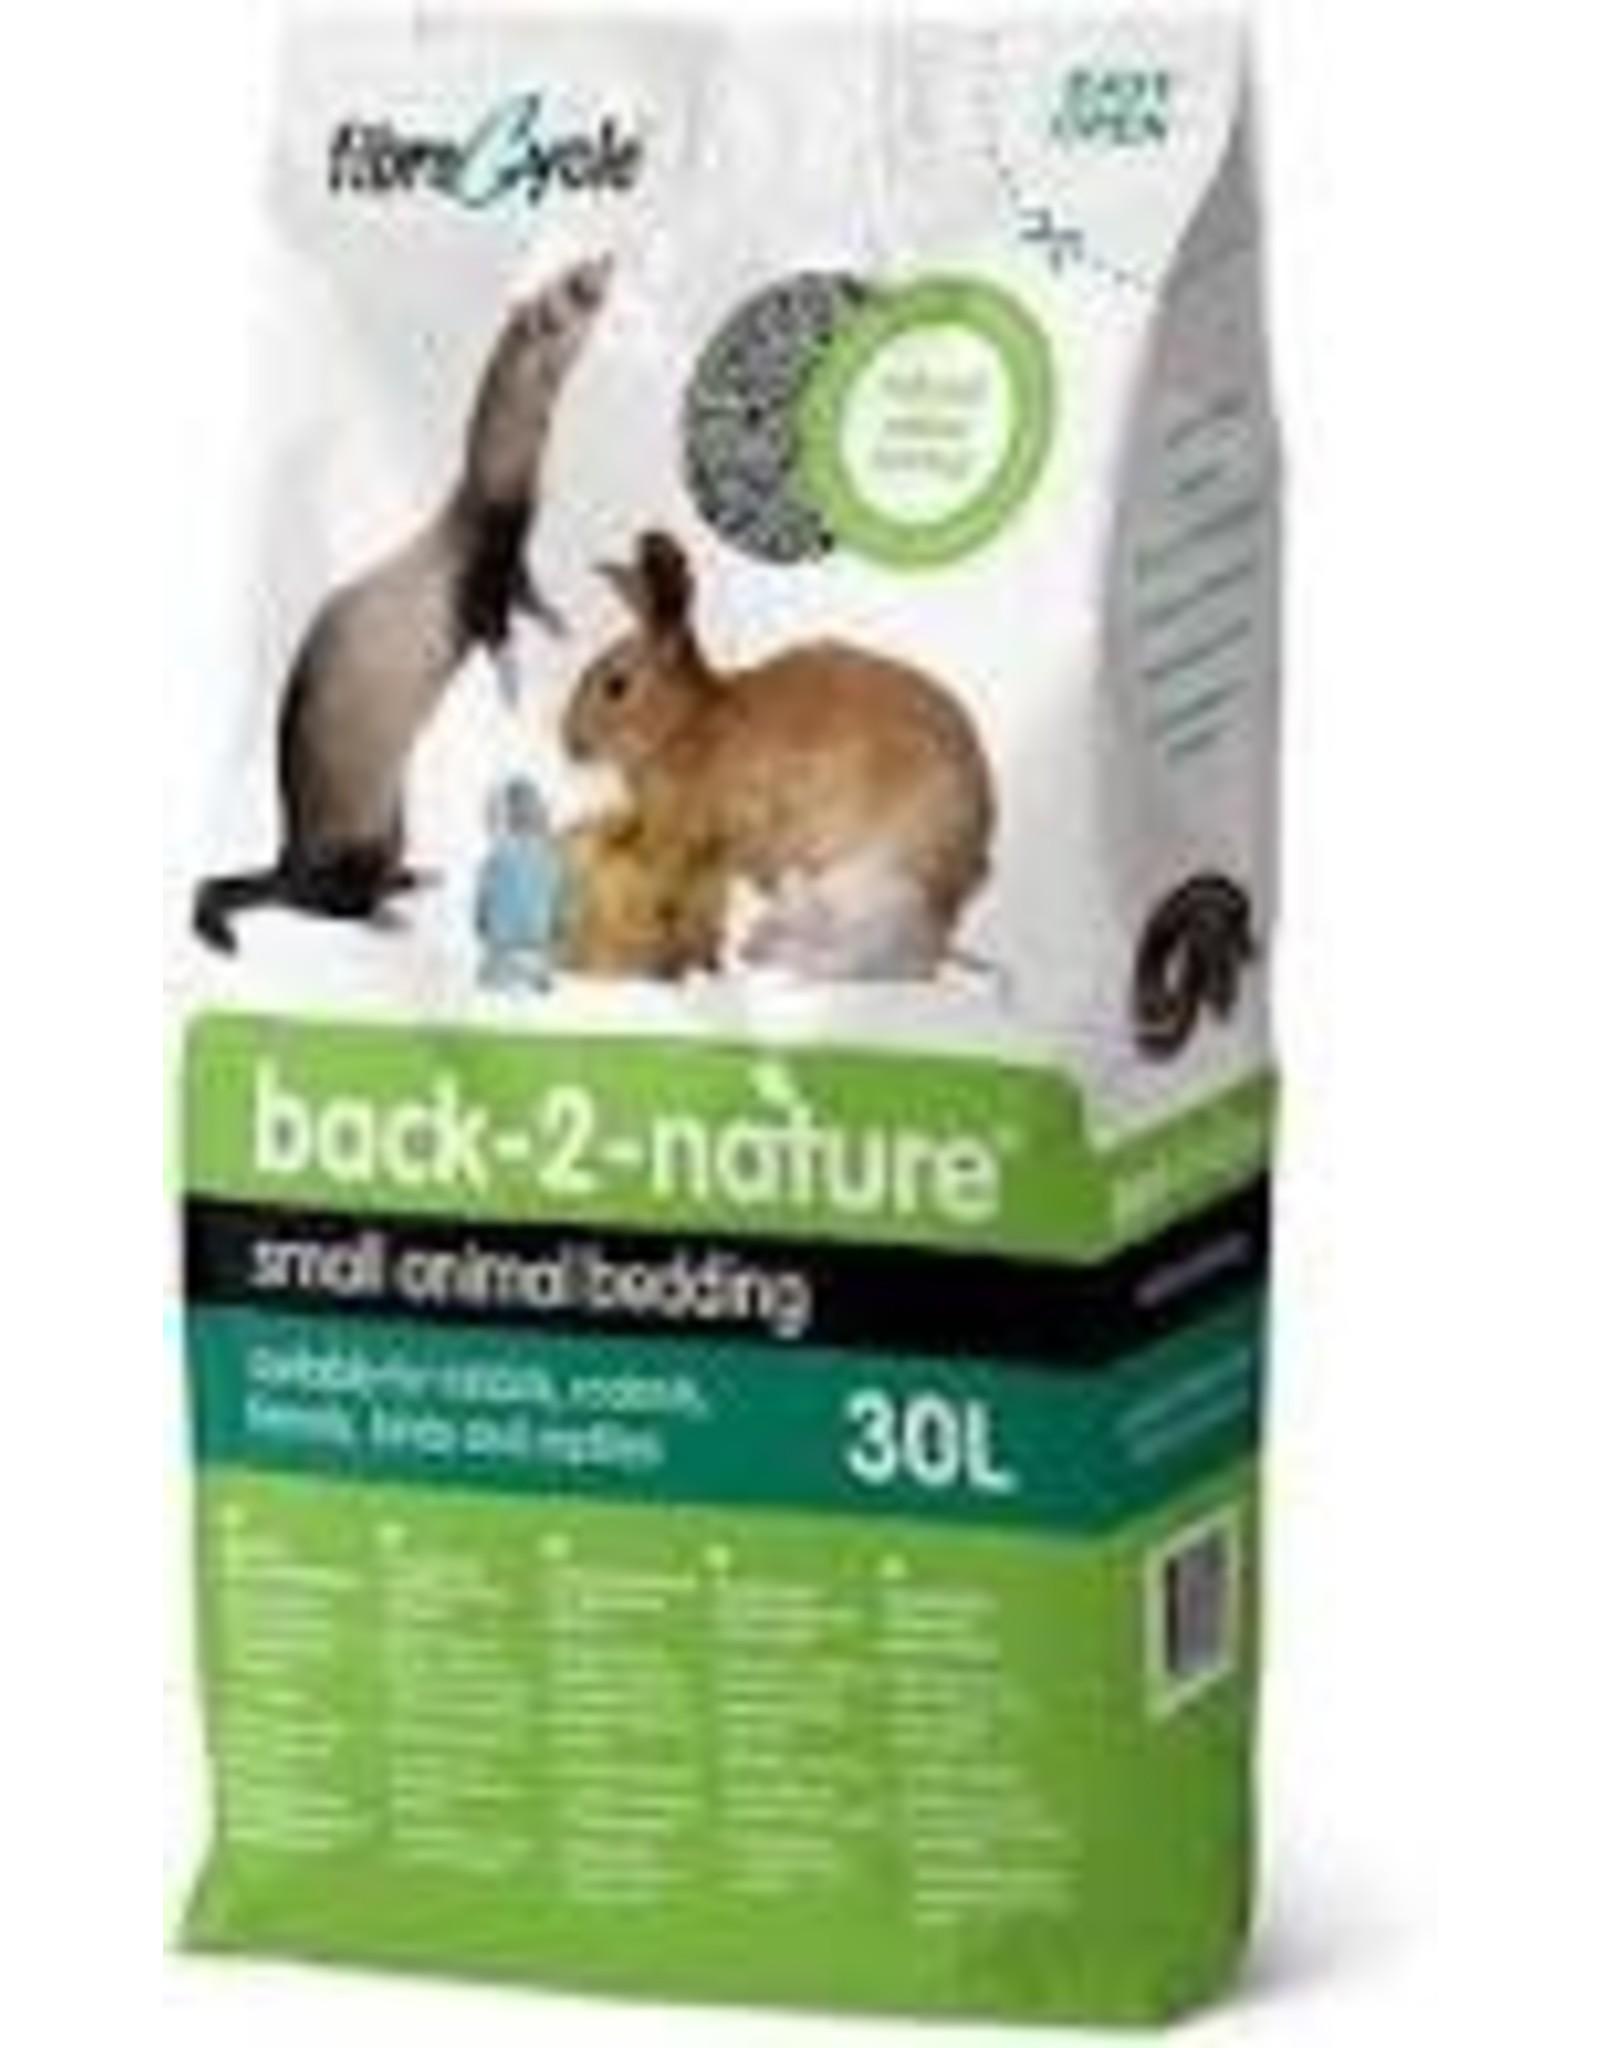 Back2Nature Back2Nature - Small Animal Bedding